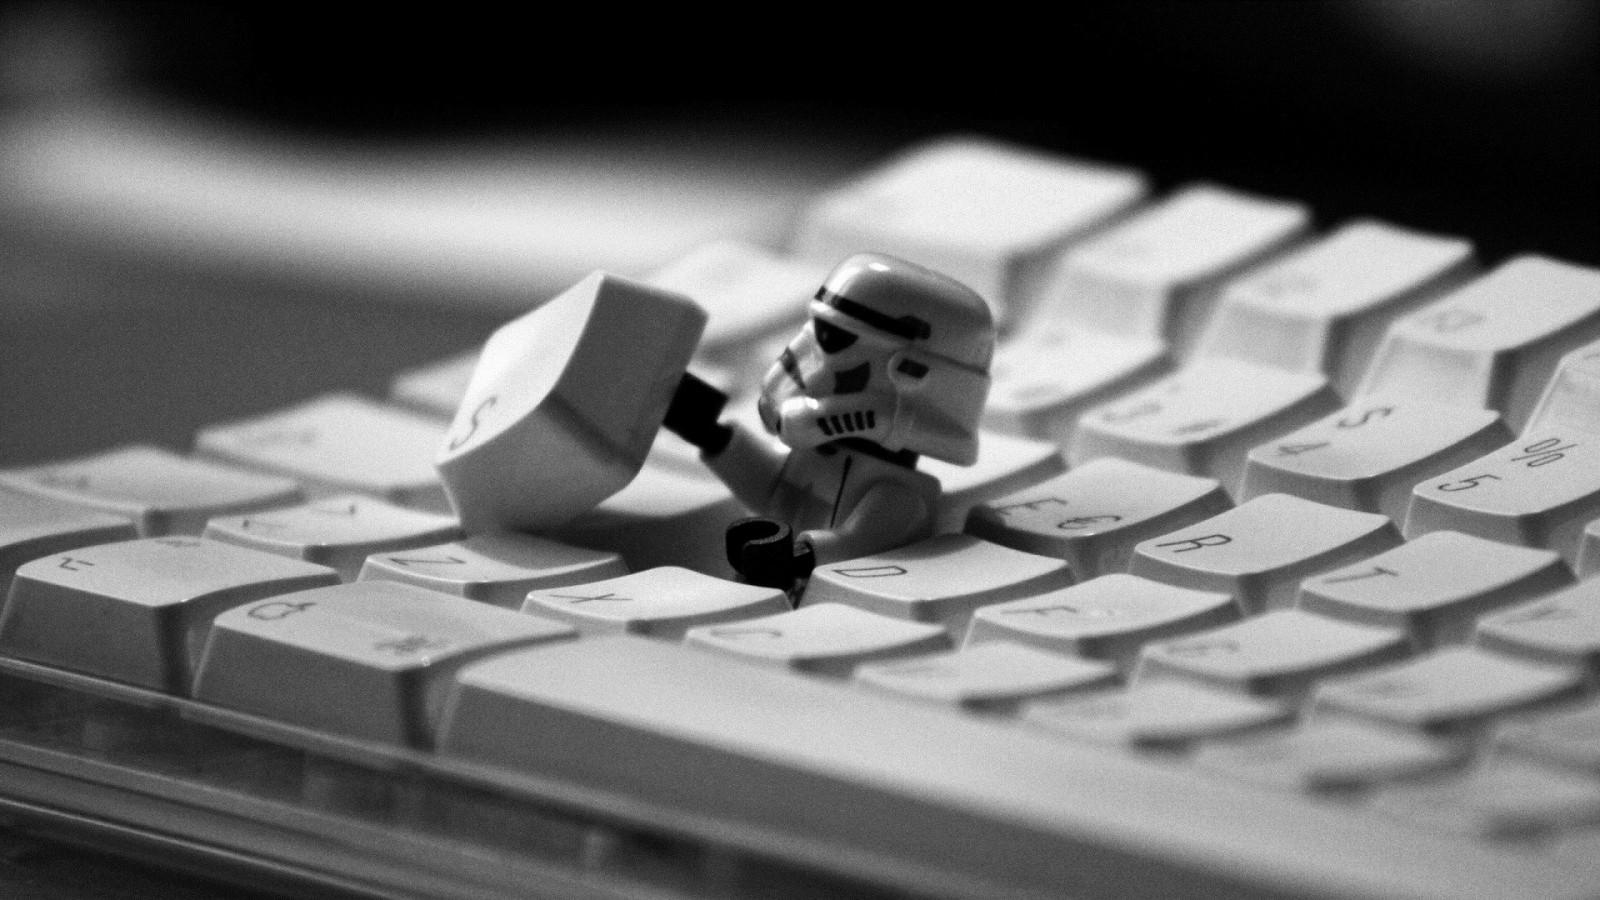 1920x1080_px_Keyboards_Lego_LEGO_Star_Wars_Star_Wars_stormtrooper-786442.jpg!d